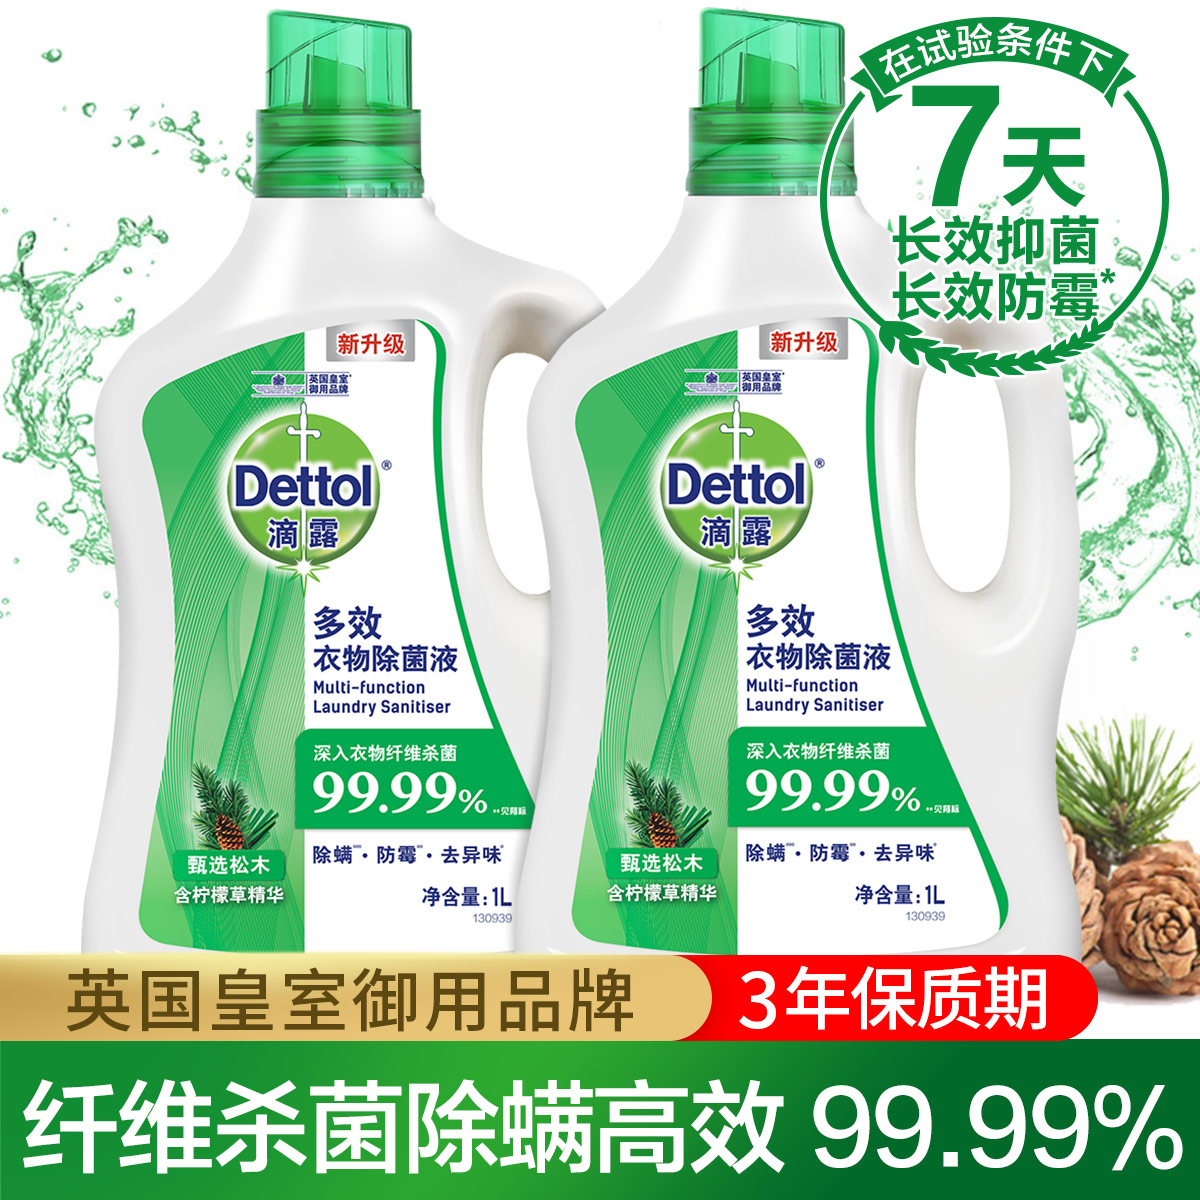 Dettol 【7天长效抑菌防霉】杀菌99.99%滴露新品多效衣物除菌液1L*2